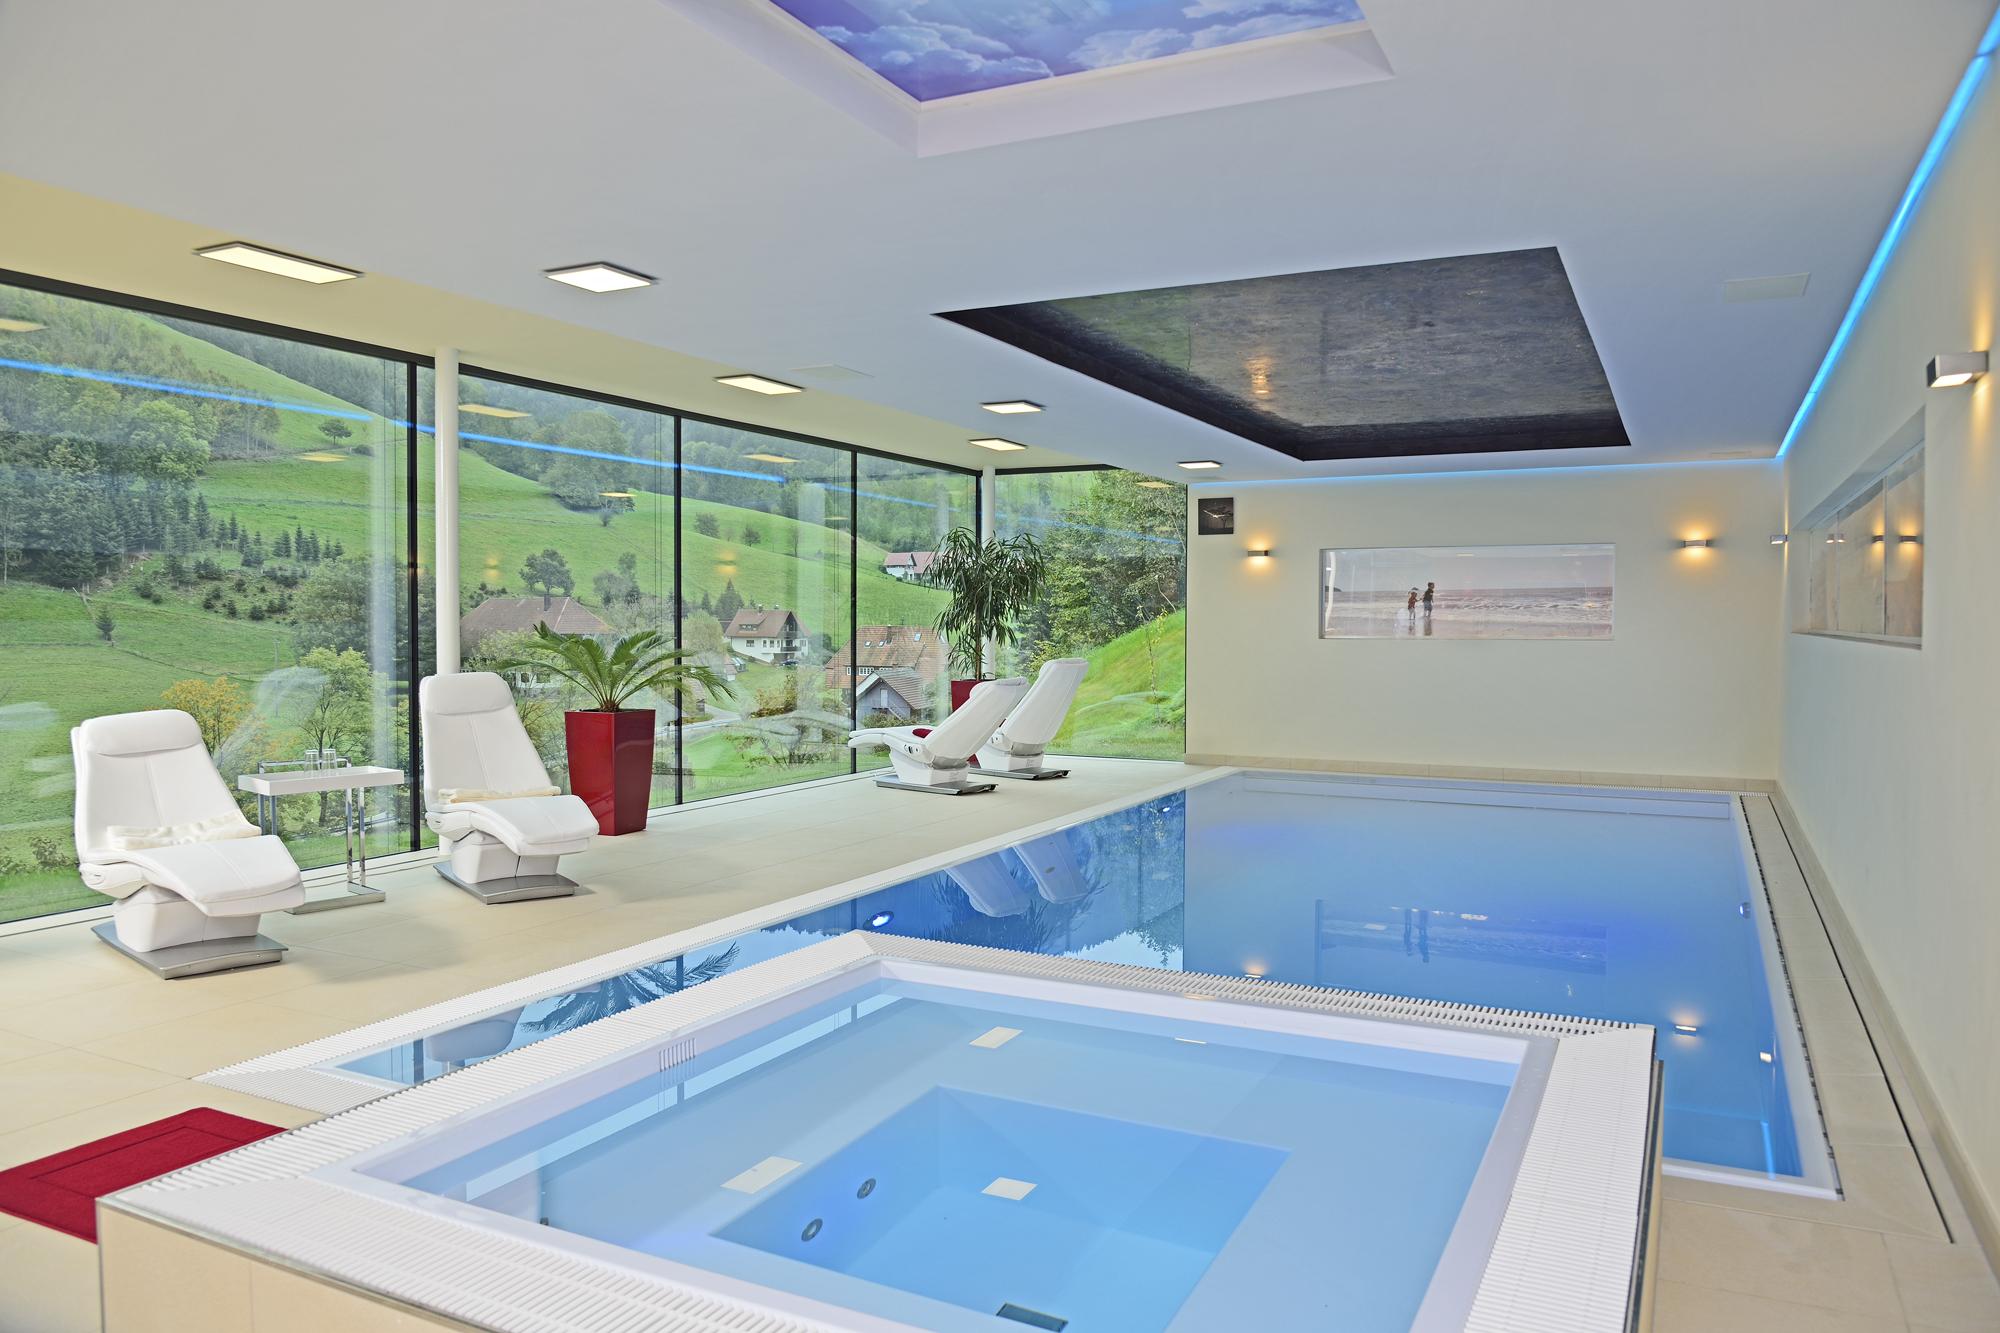 Custom schwimmbecken mit Custom Whirlpool in eisblau